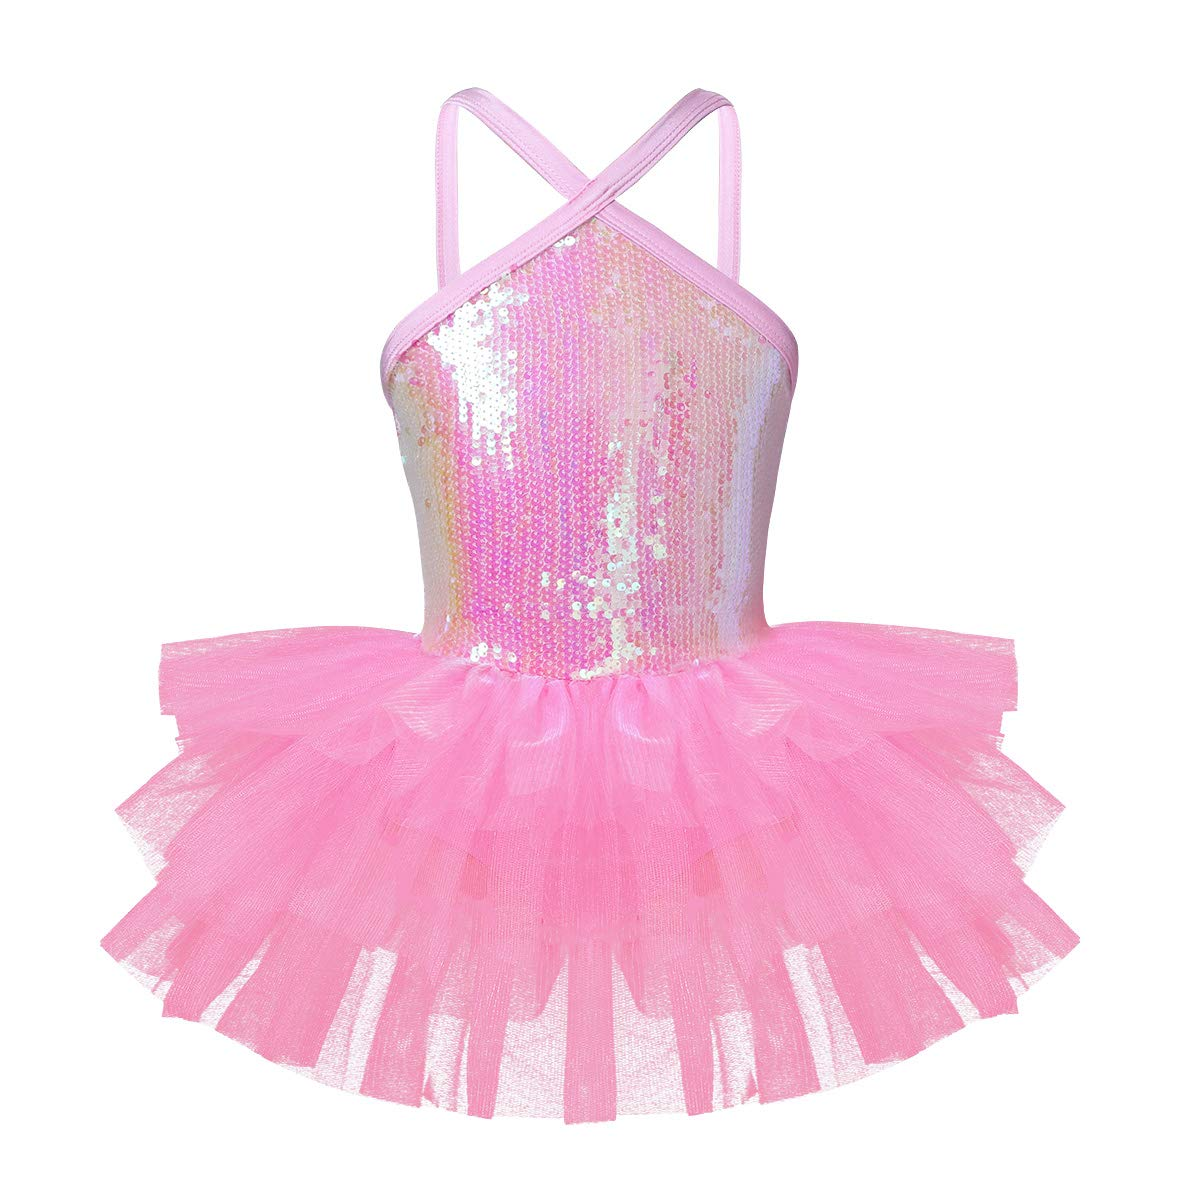 Agoky Girls Sequined Sleeveless Ballet Dance Leotard Tutu Skirted Dress Costumes Pink Halter Sequins 3 by Agoky